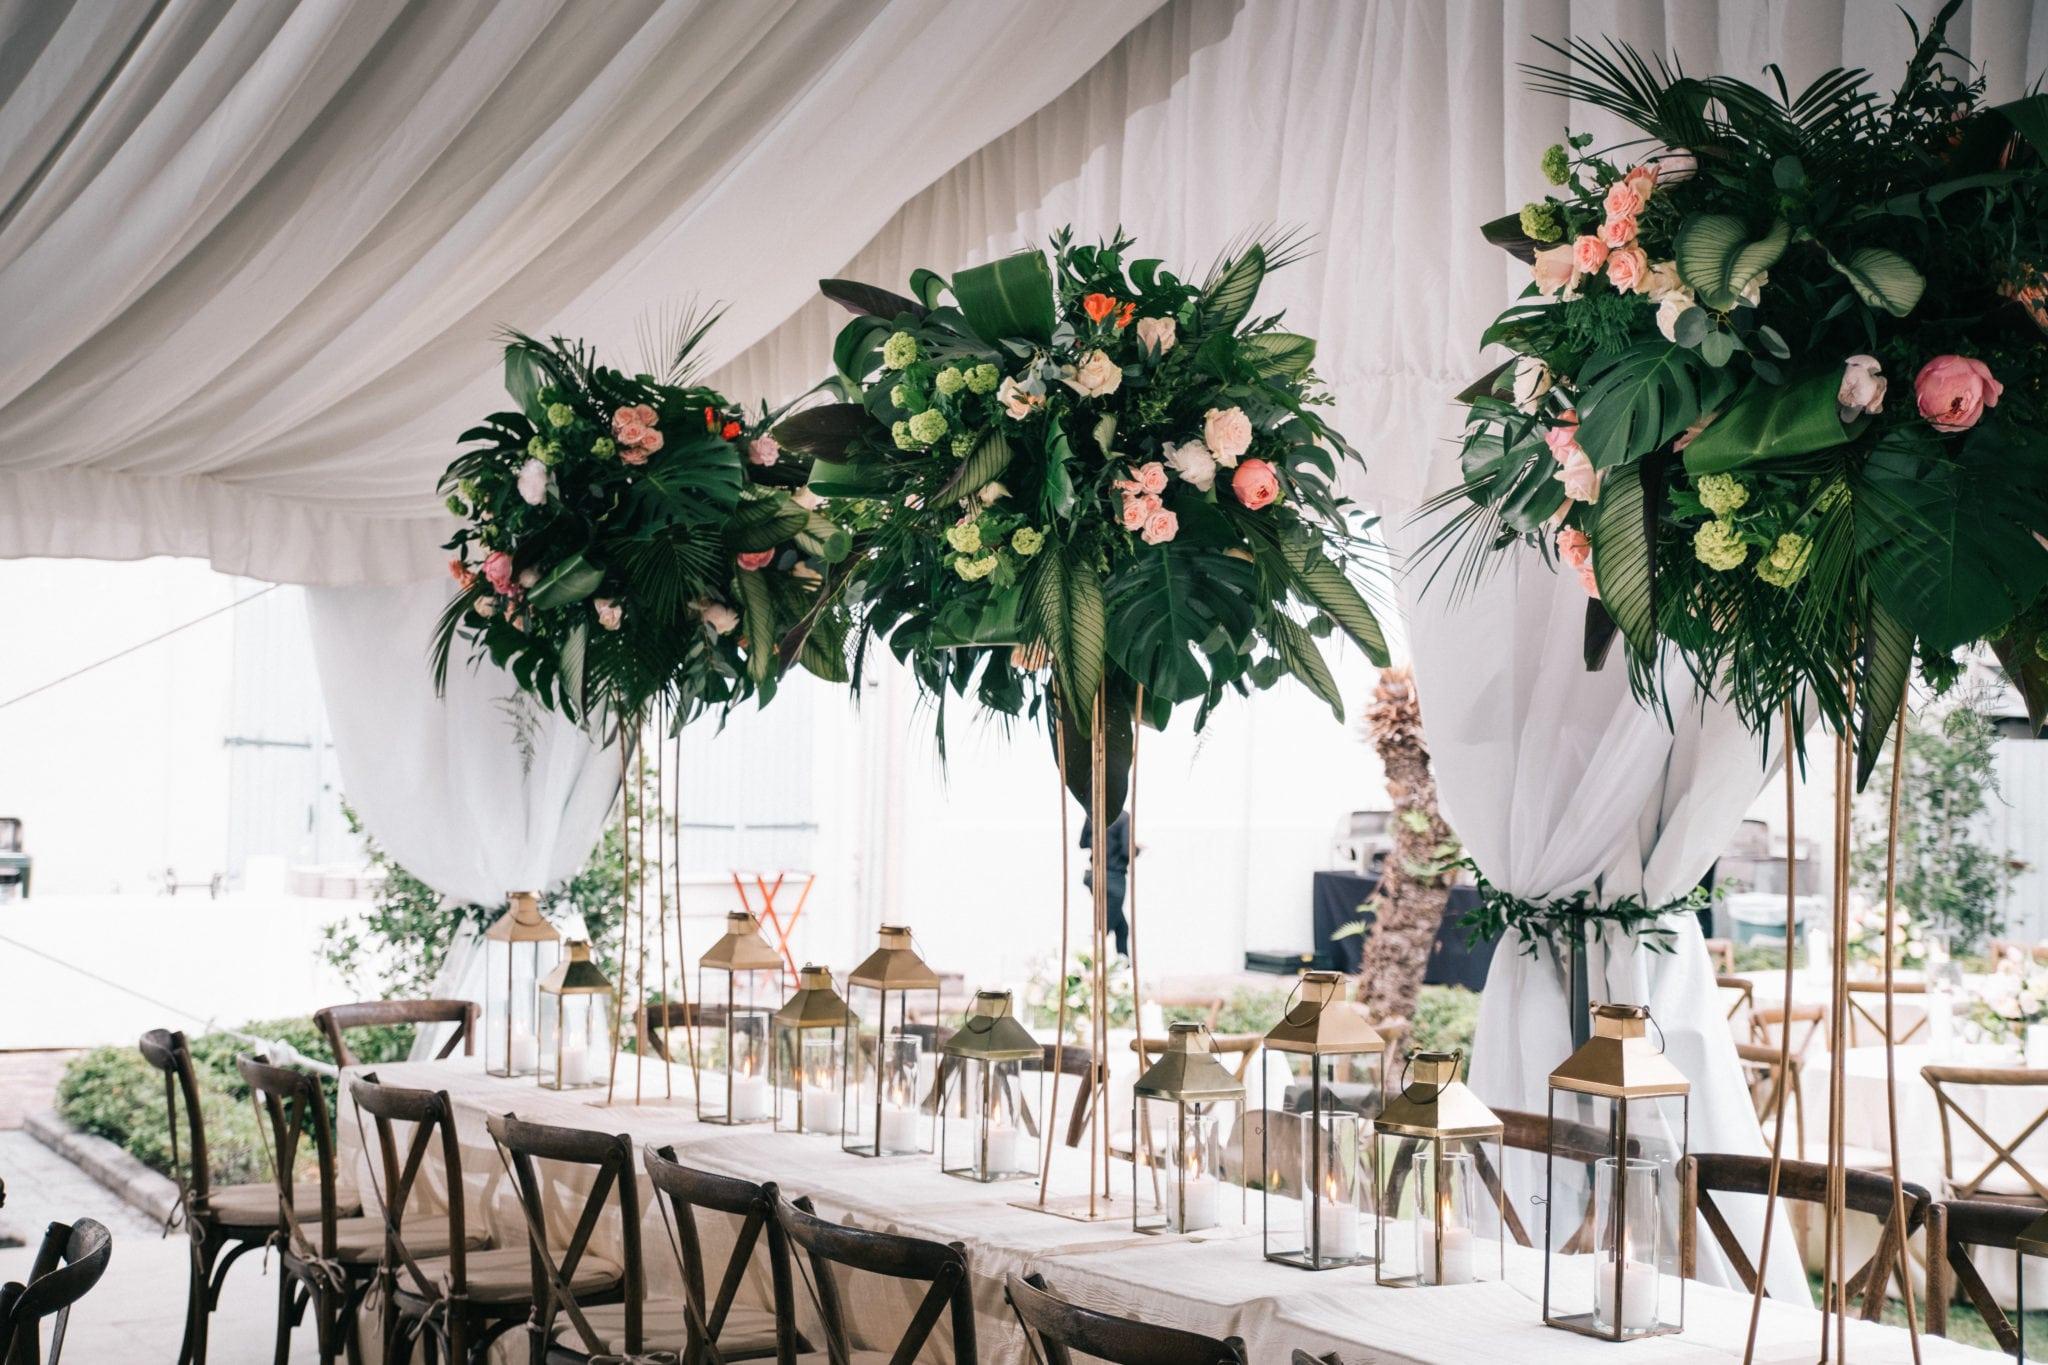 New orleans florist Kim starr wise puts together dramatic summer wedding arrangements